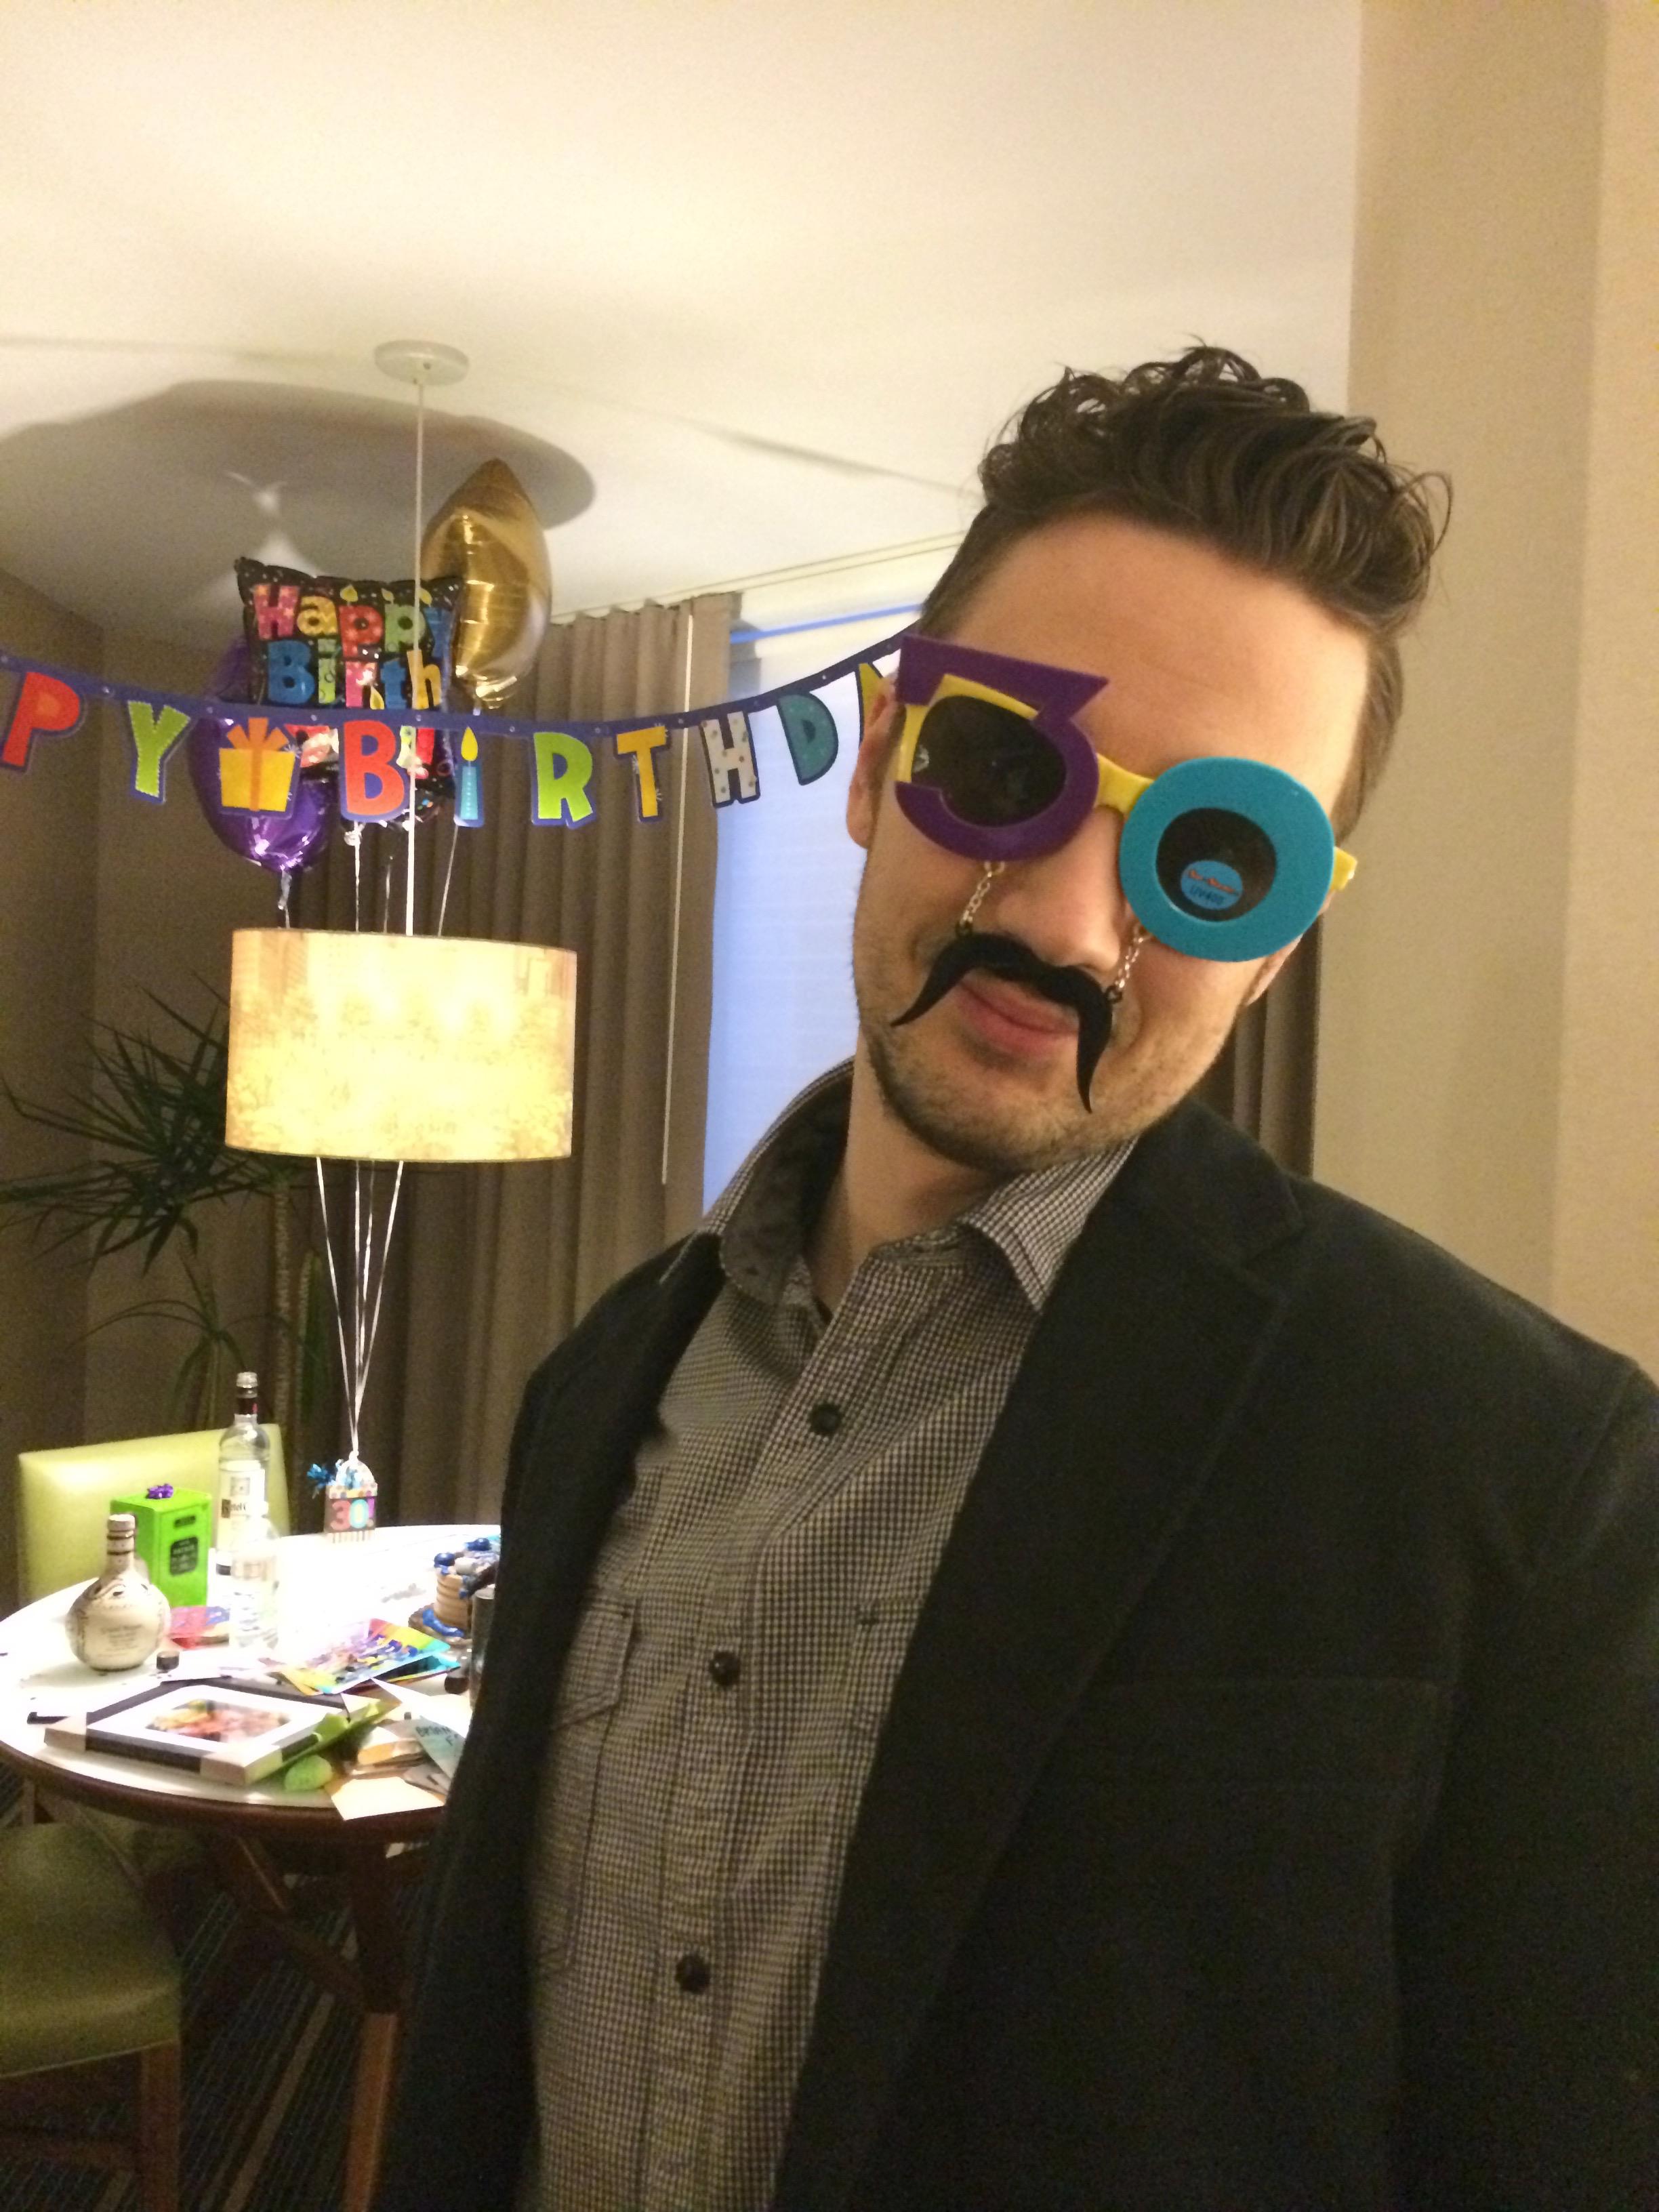 Brians's 30th birthday